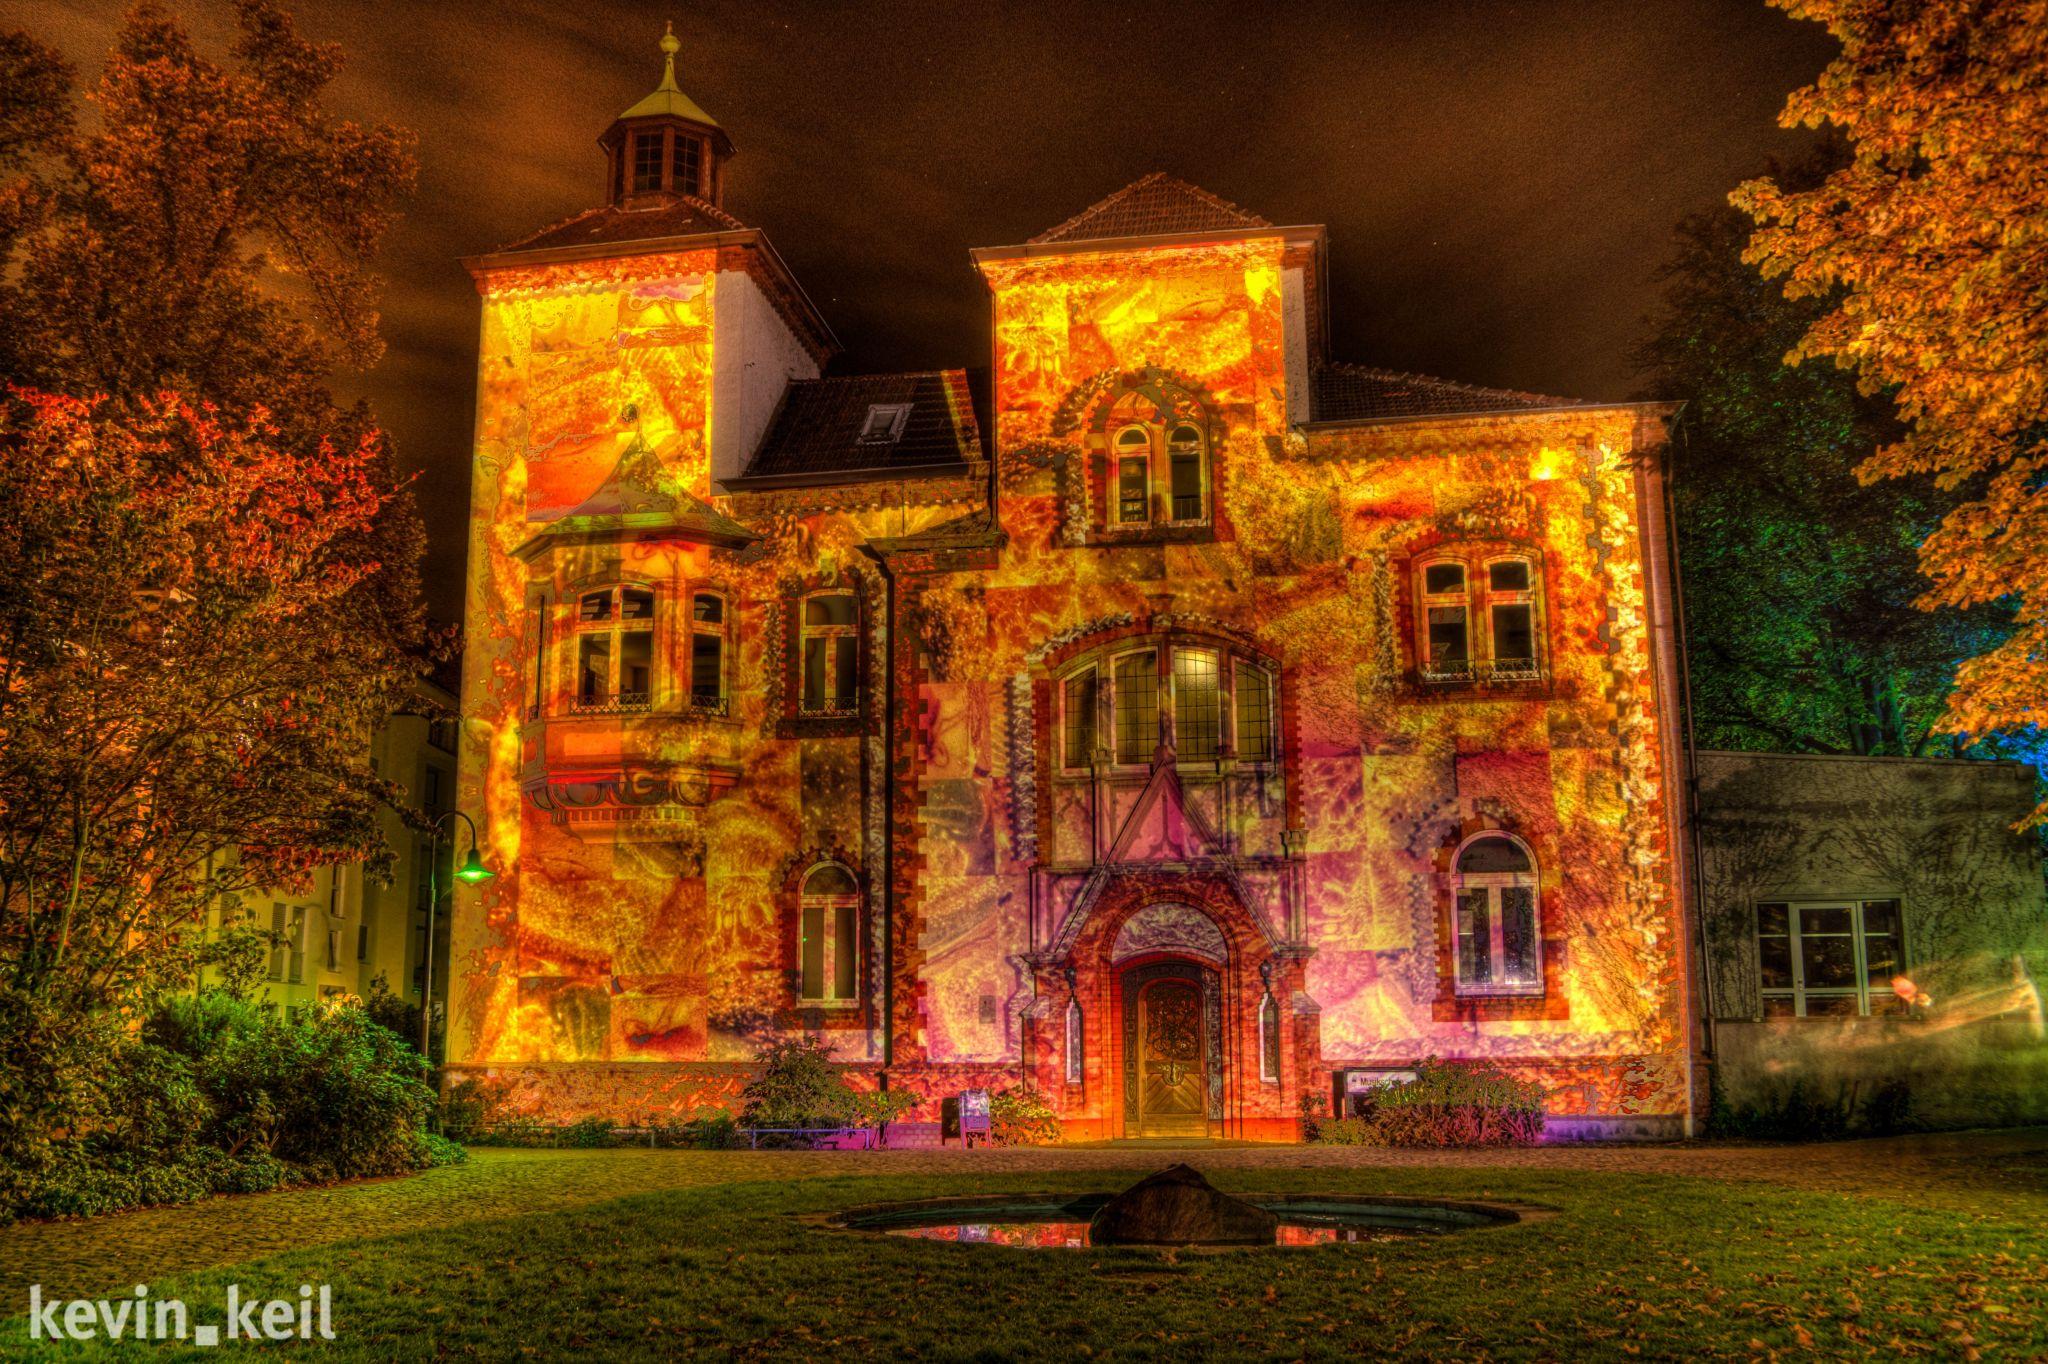 Music school of Recklinghausen, Germany